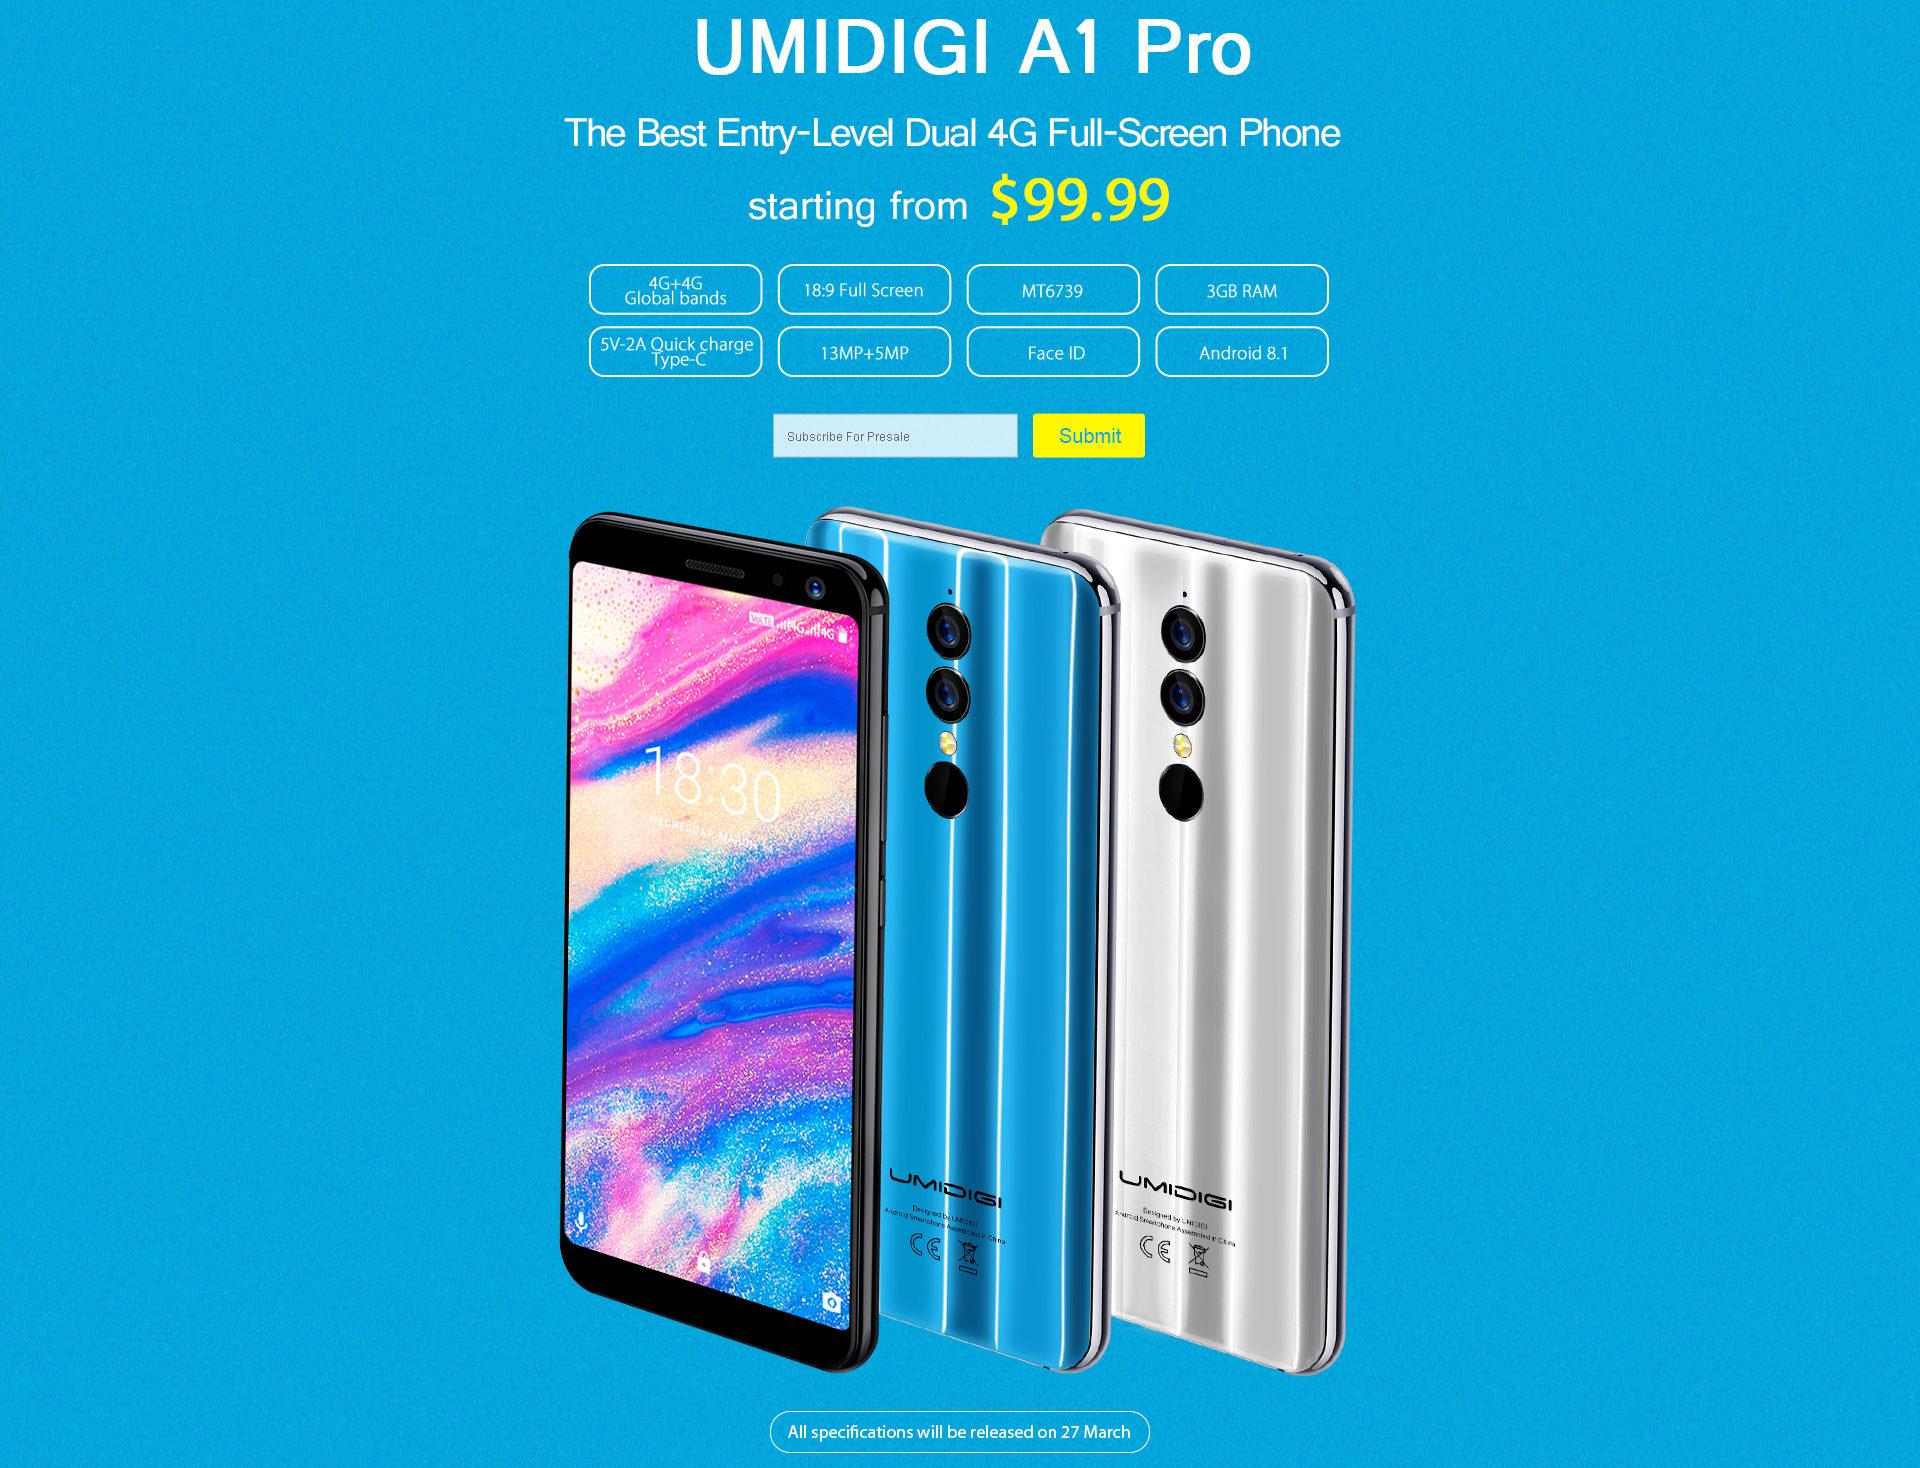 UMIDIGI A1 Pro